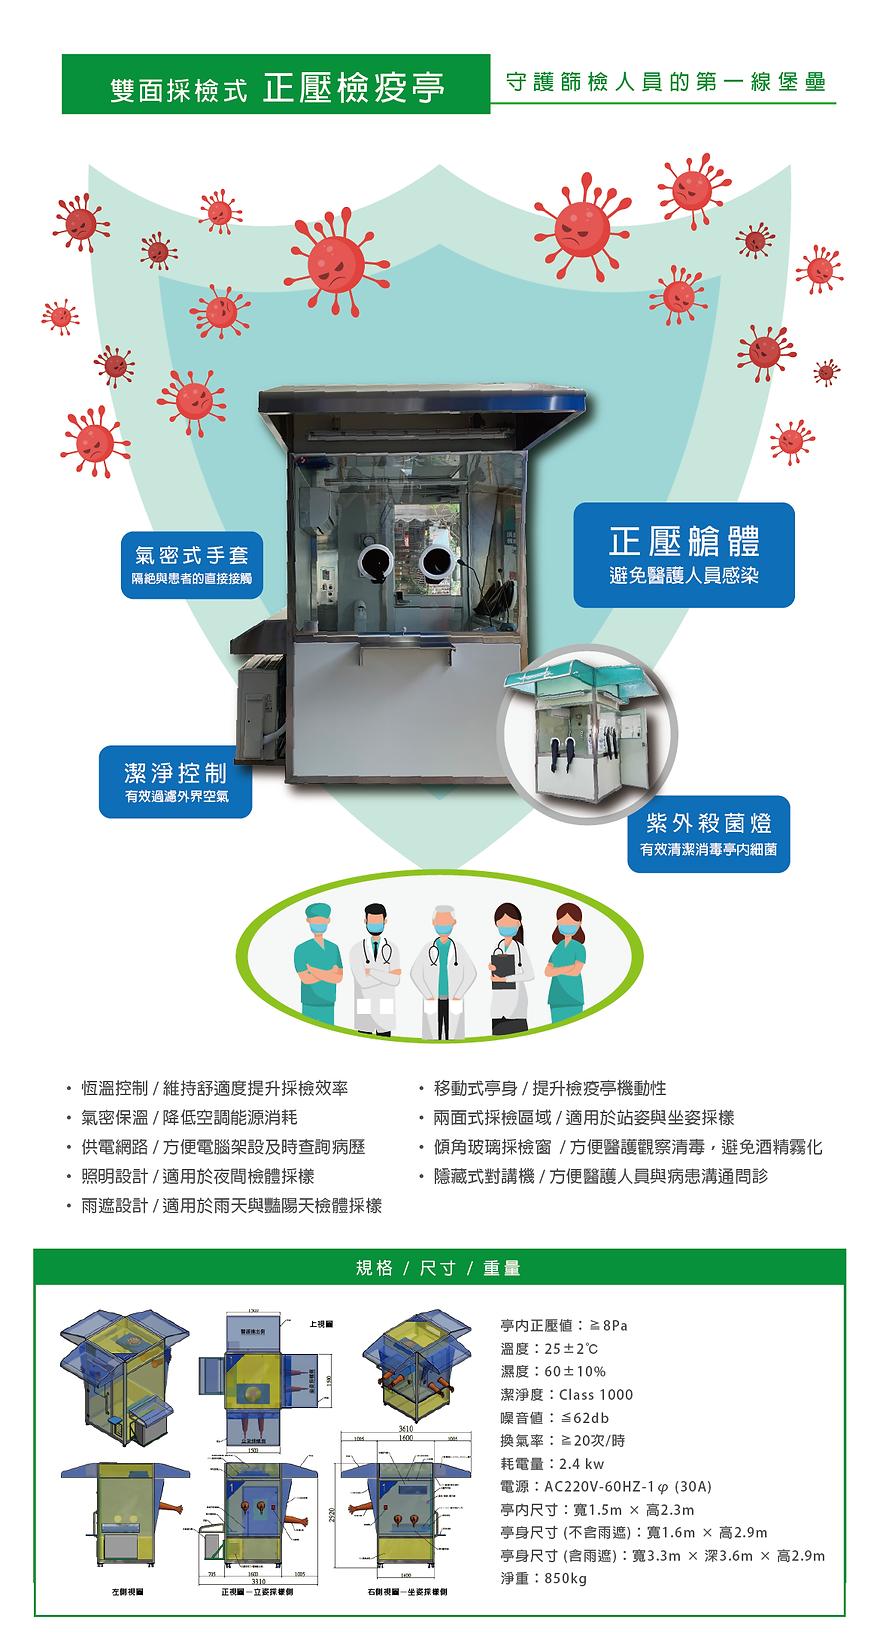 ASTER - DM - 正壓式採檢亭_20210608-C-SPEC.png